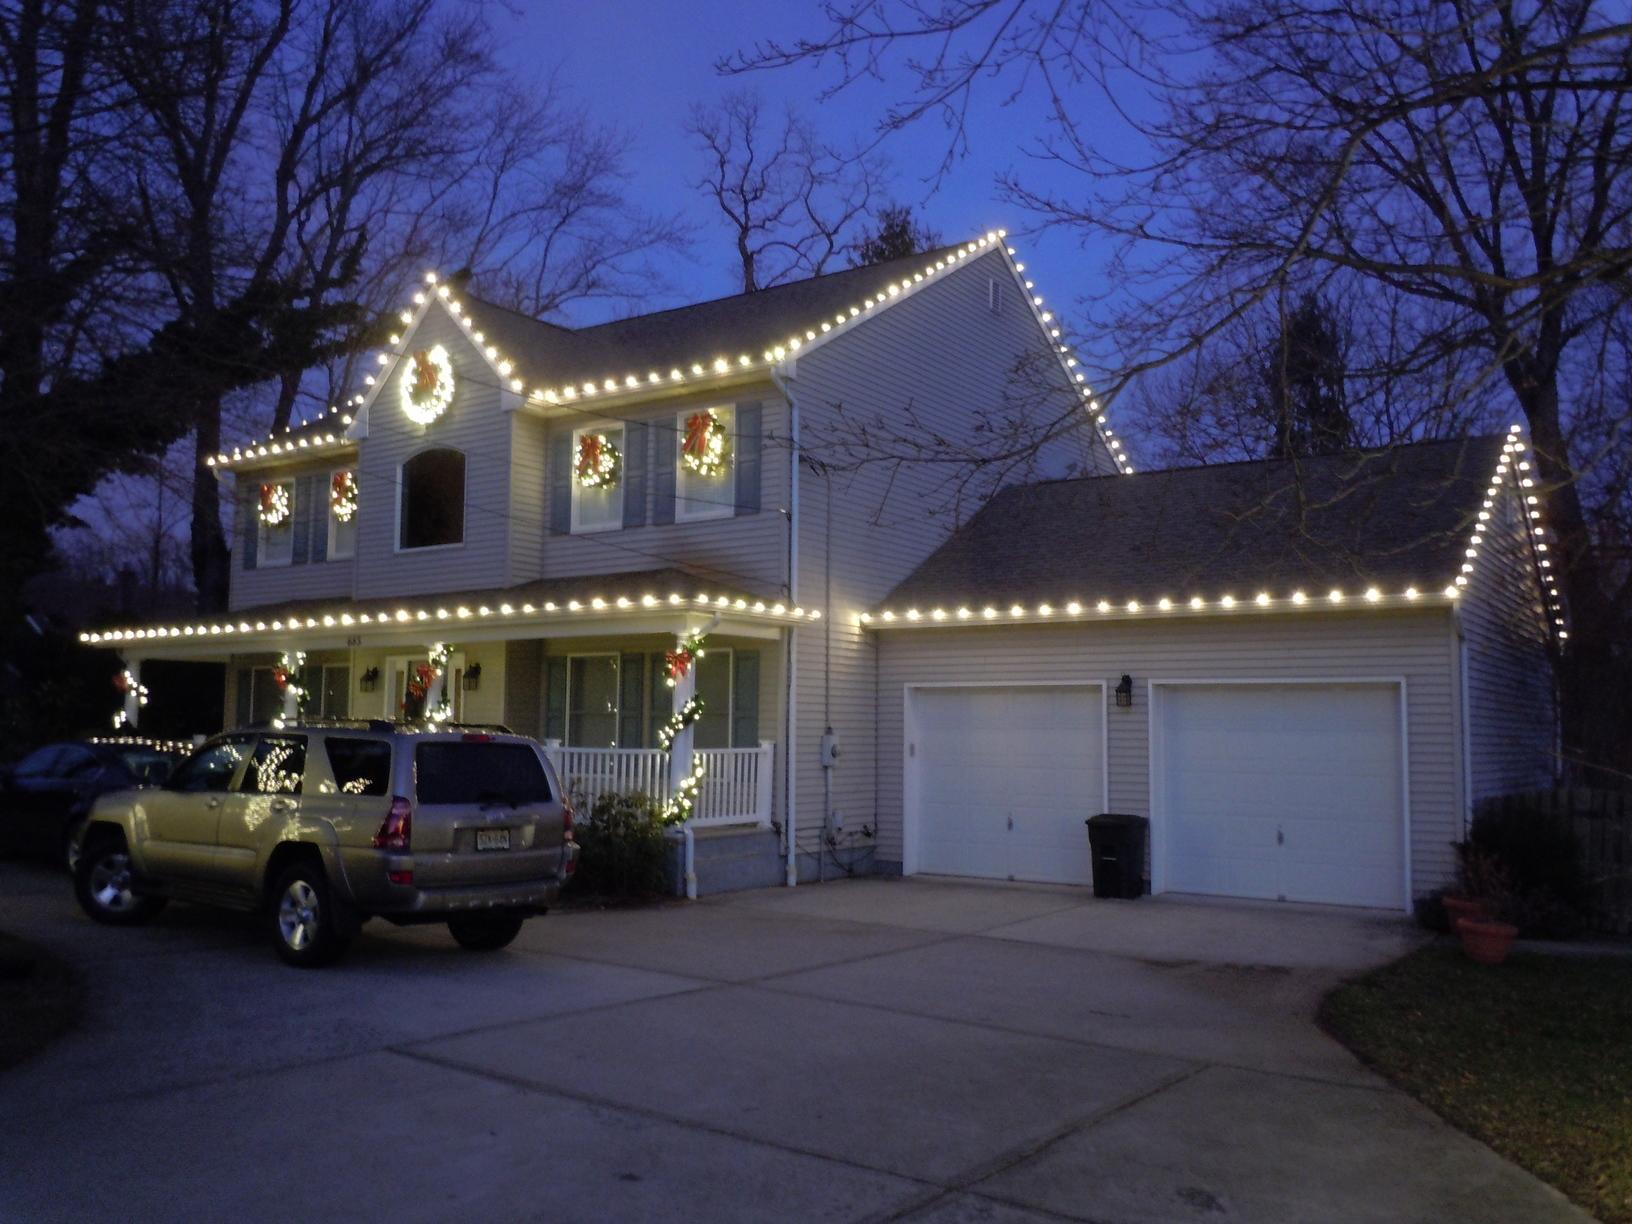 Christmas Light Display in North Long Branch, NJ